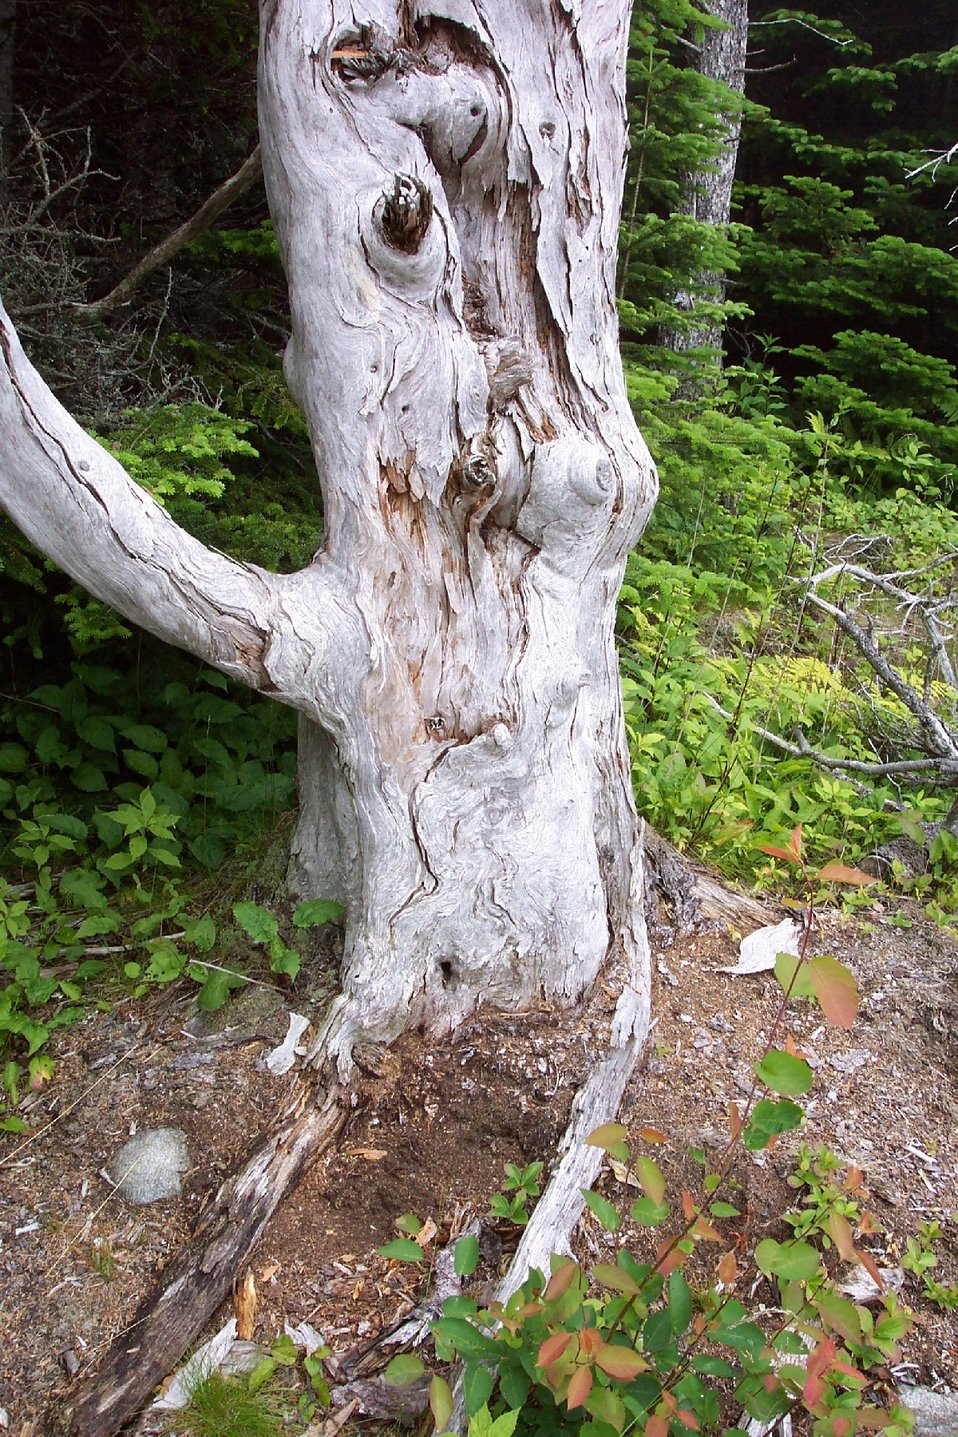 Patterns in a weather-beaten tree trunk.